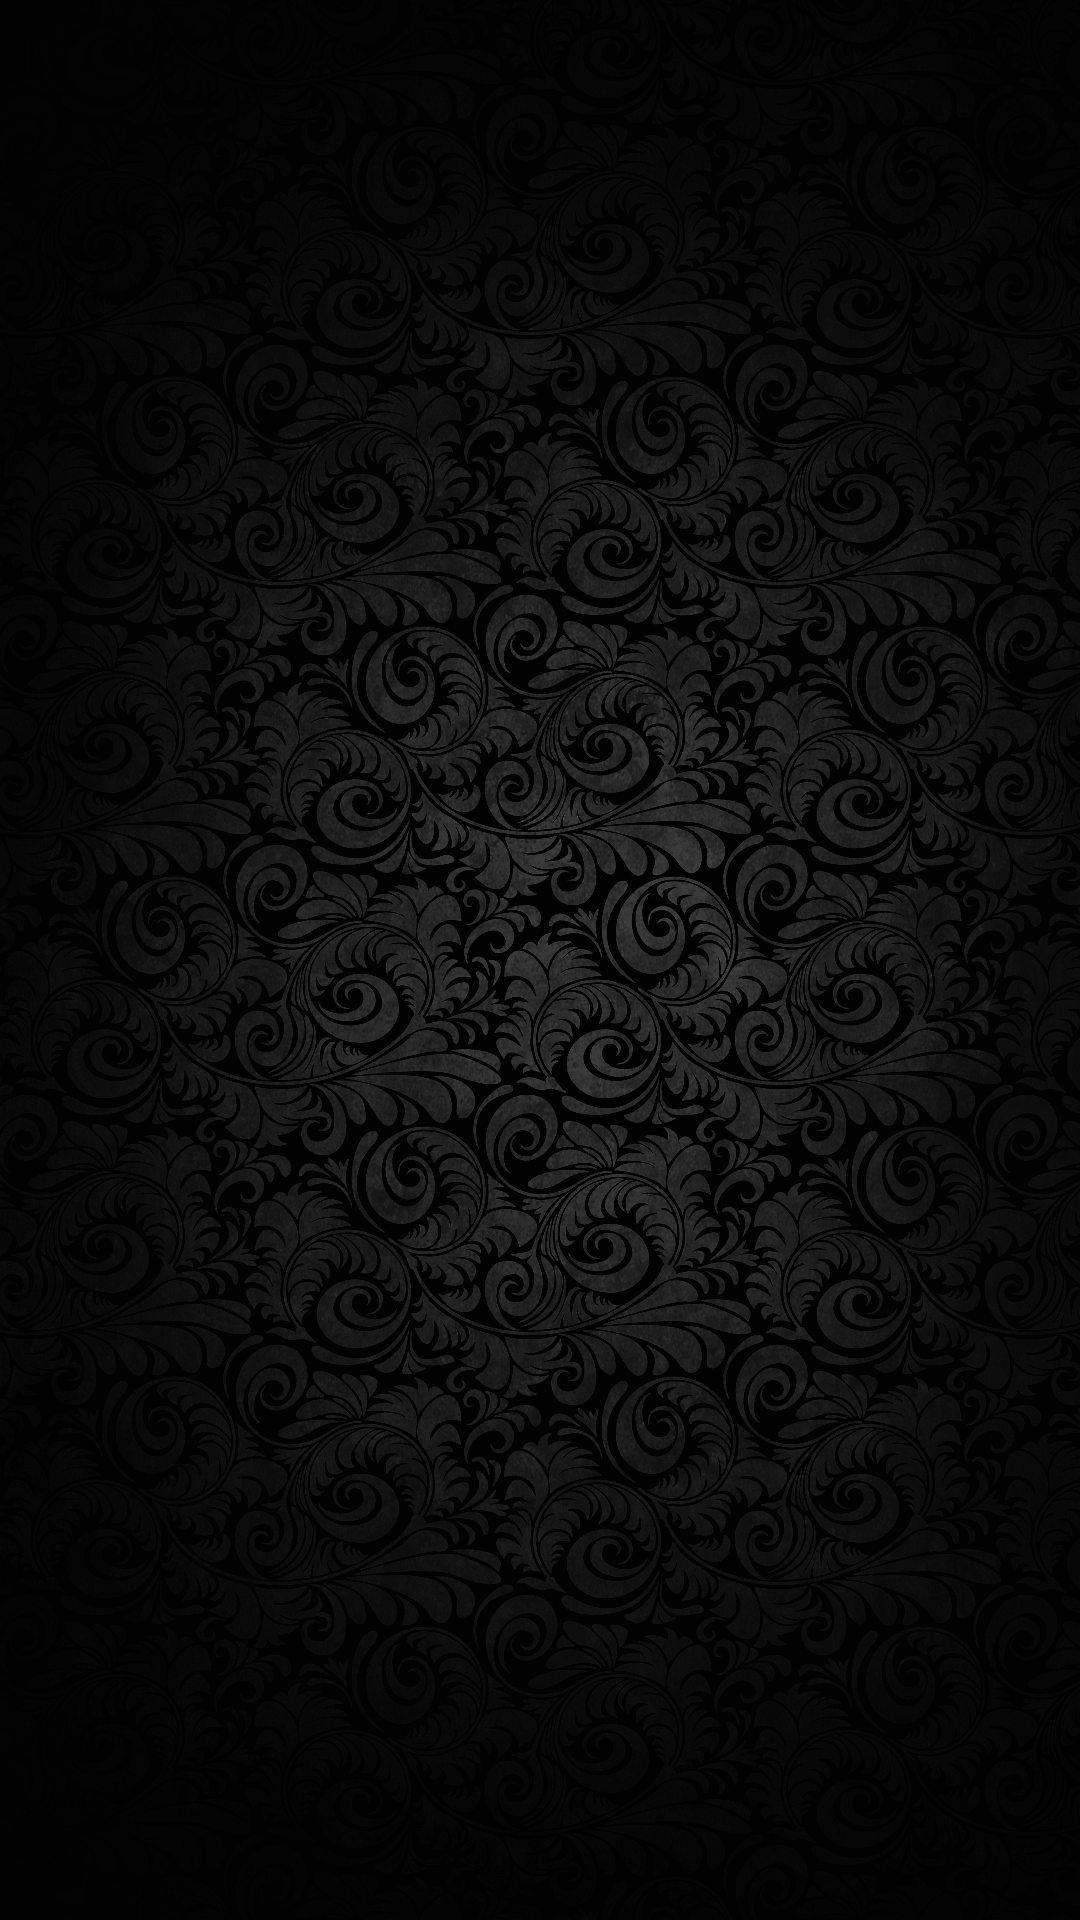 Black Wallpaper 1080